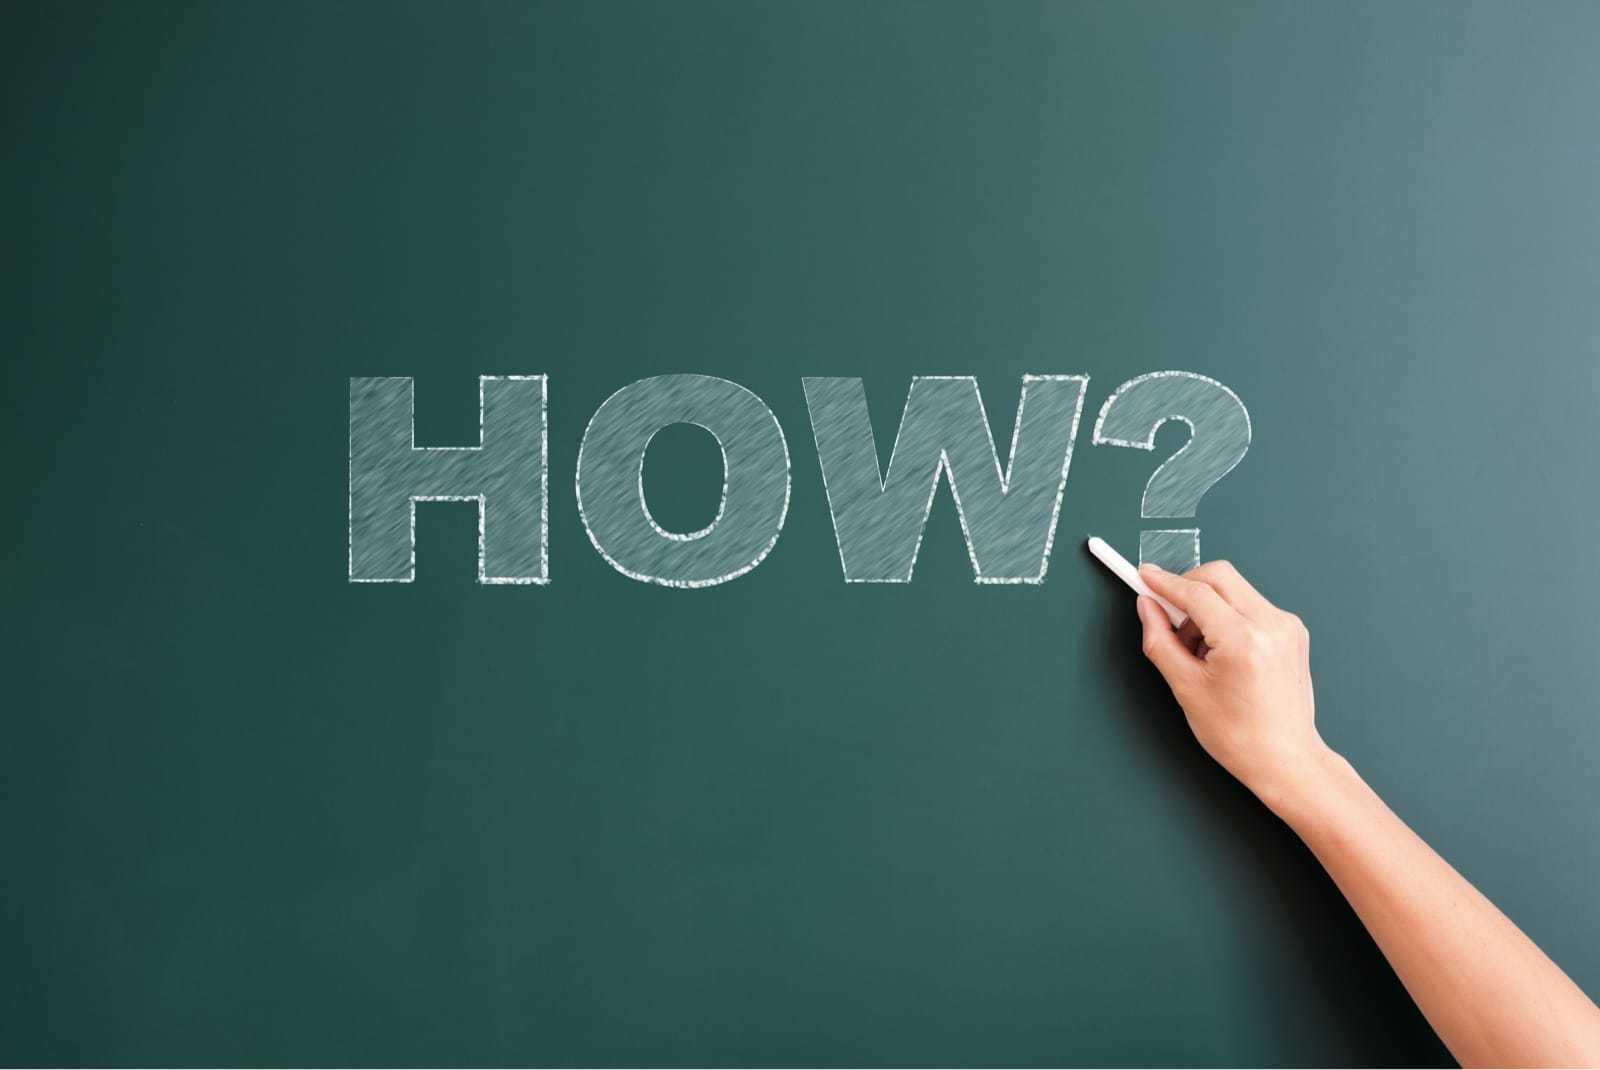 「HOW」と黒板に書く手